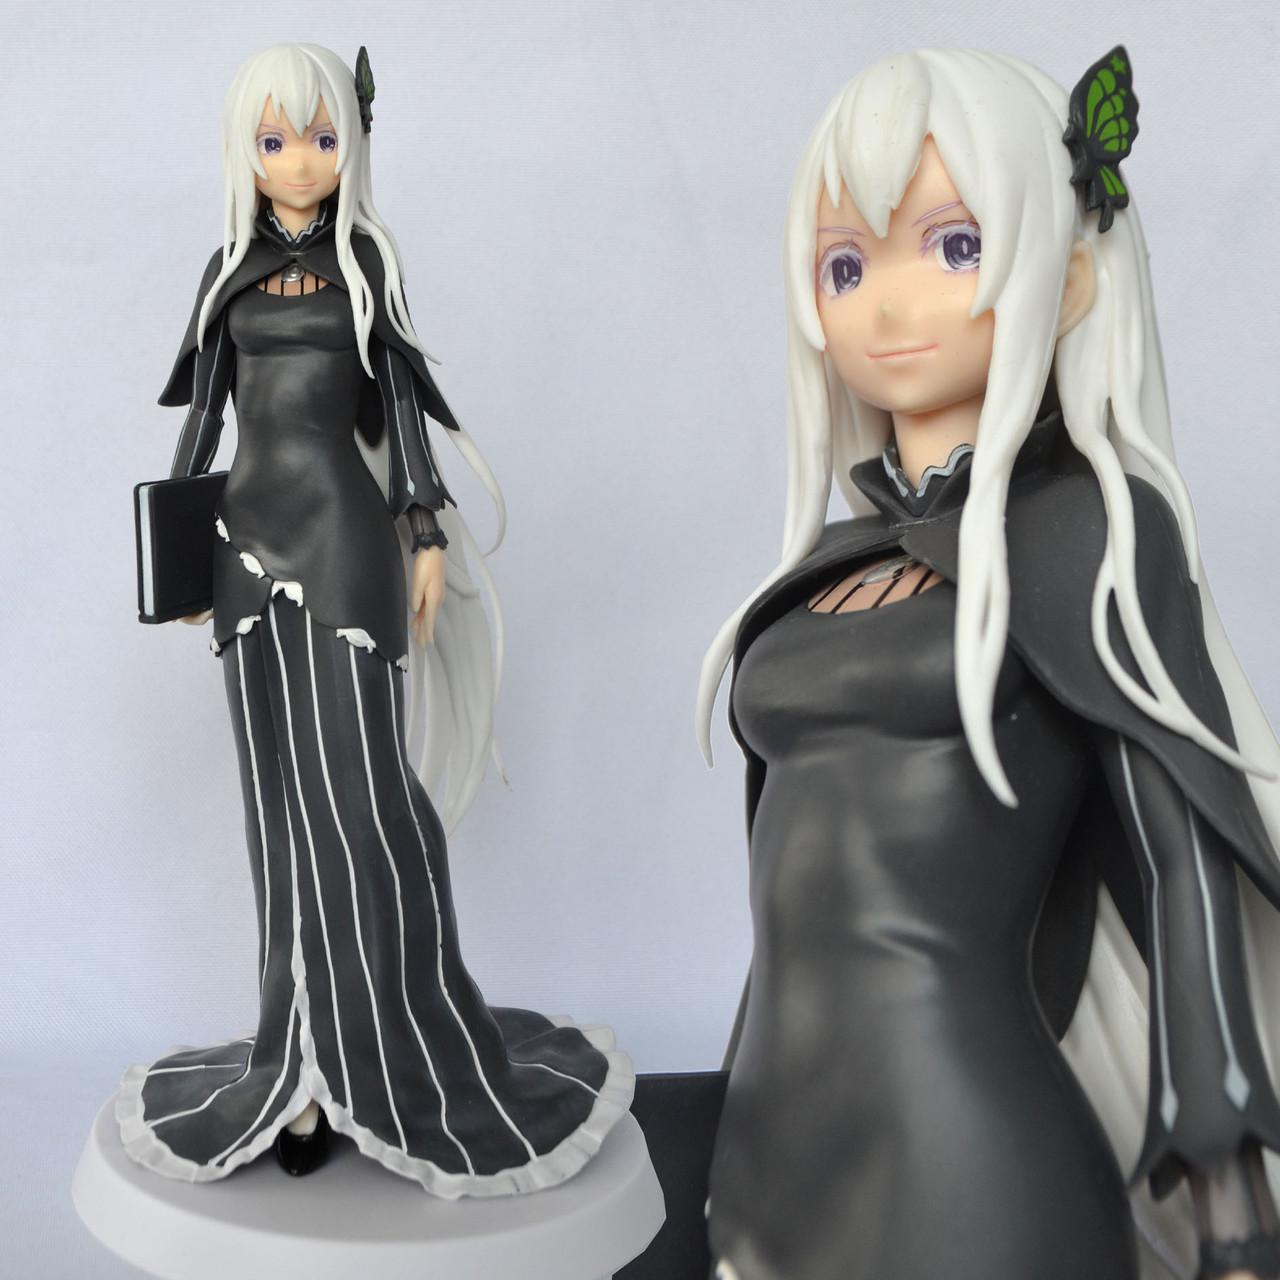 Фігурка Re:Zero - Echidna - Super Premium Figure  - Sega